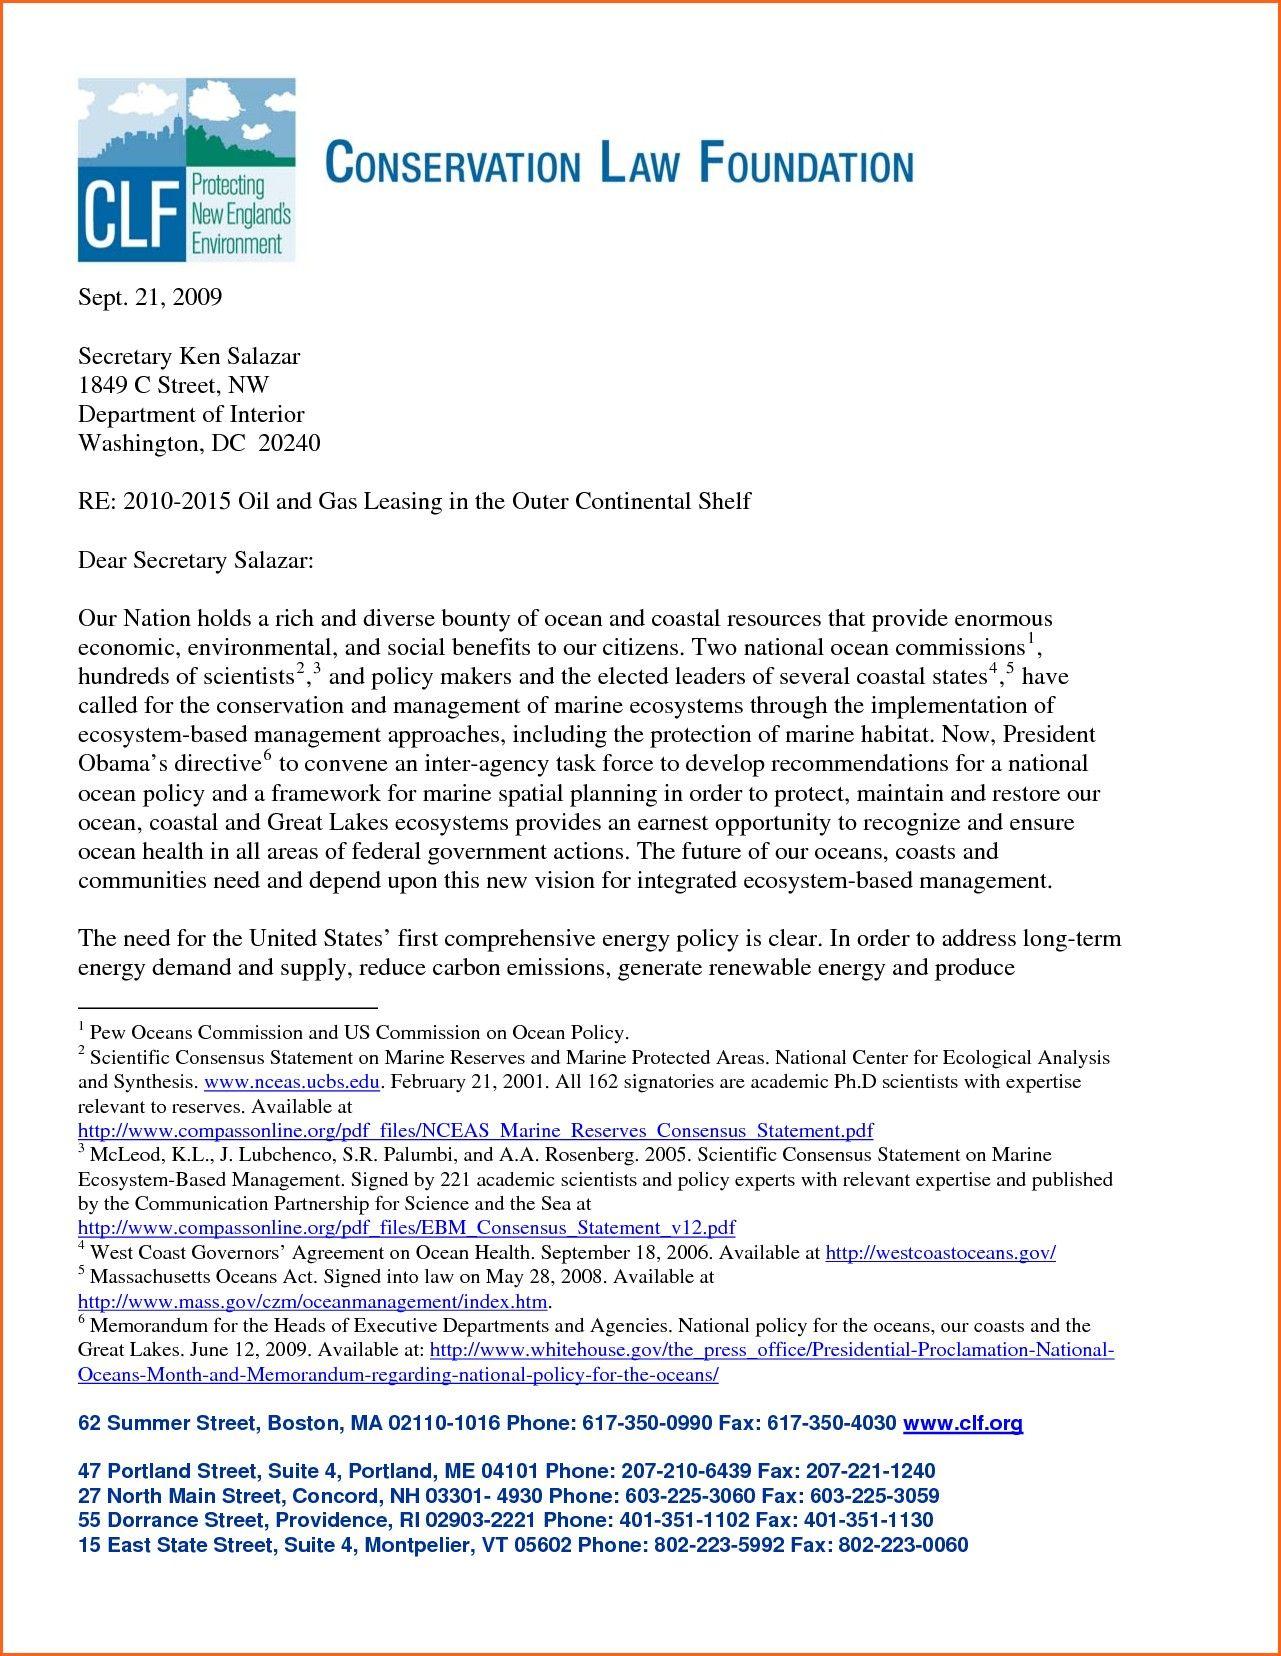 fresh letterhead text sample pdf format cute resume templates word for first job marketing director cv